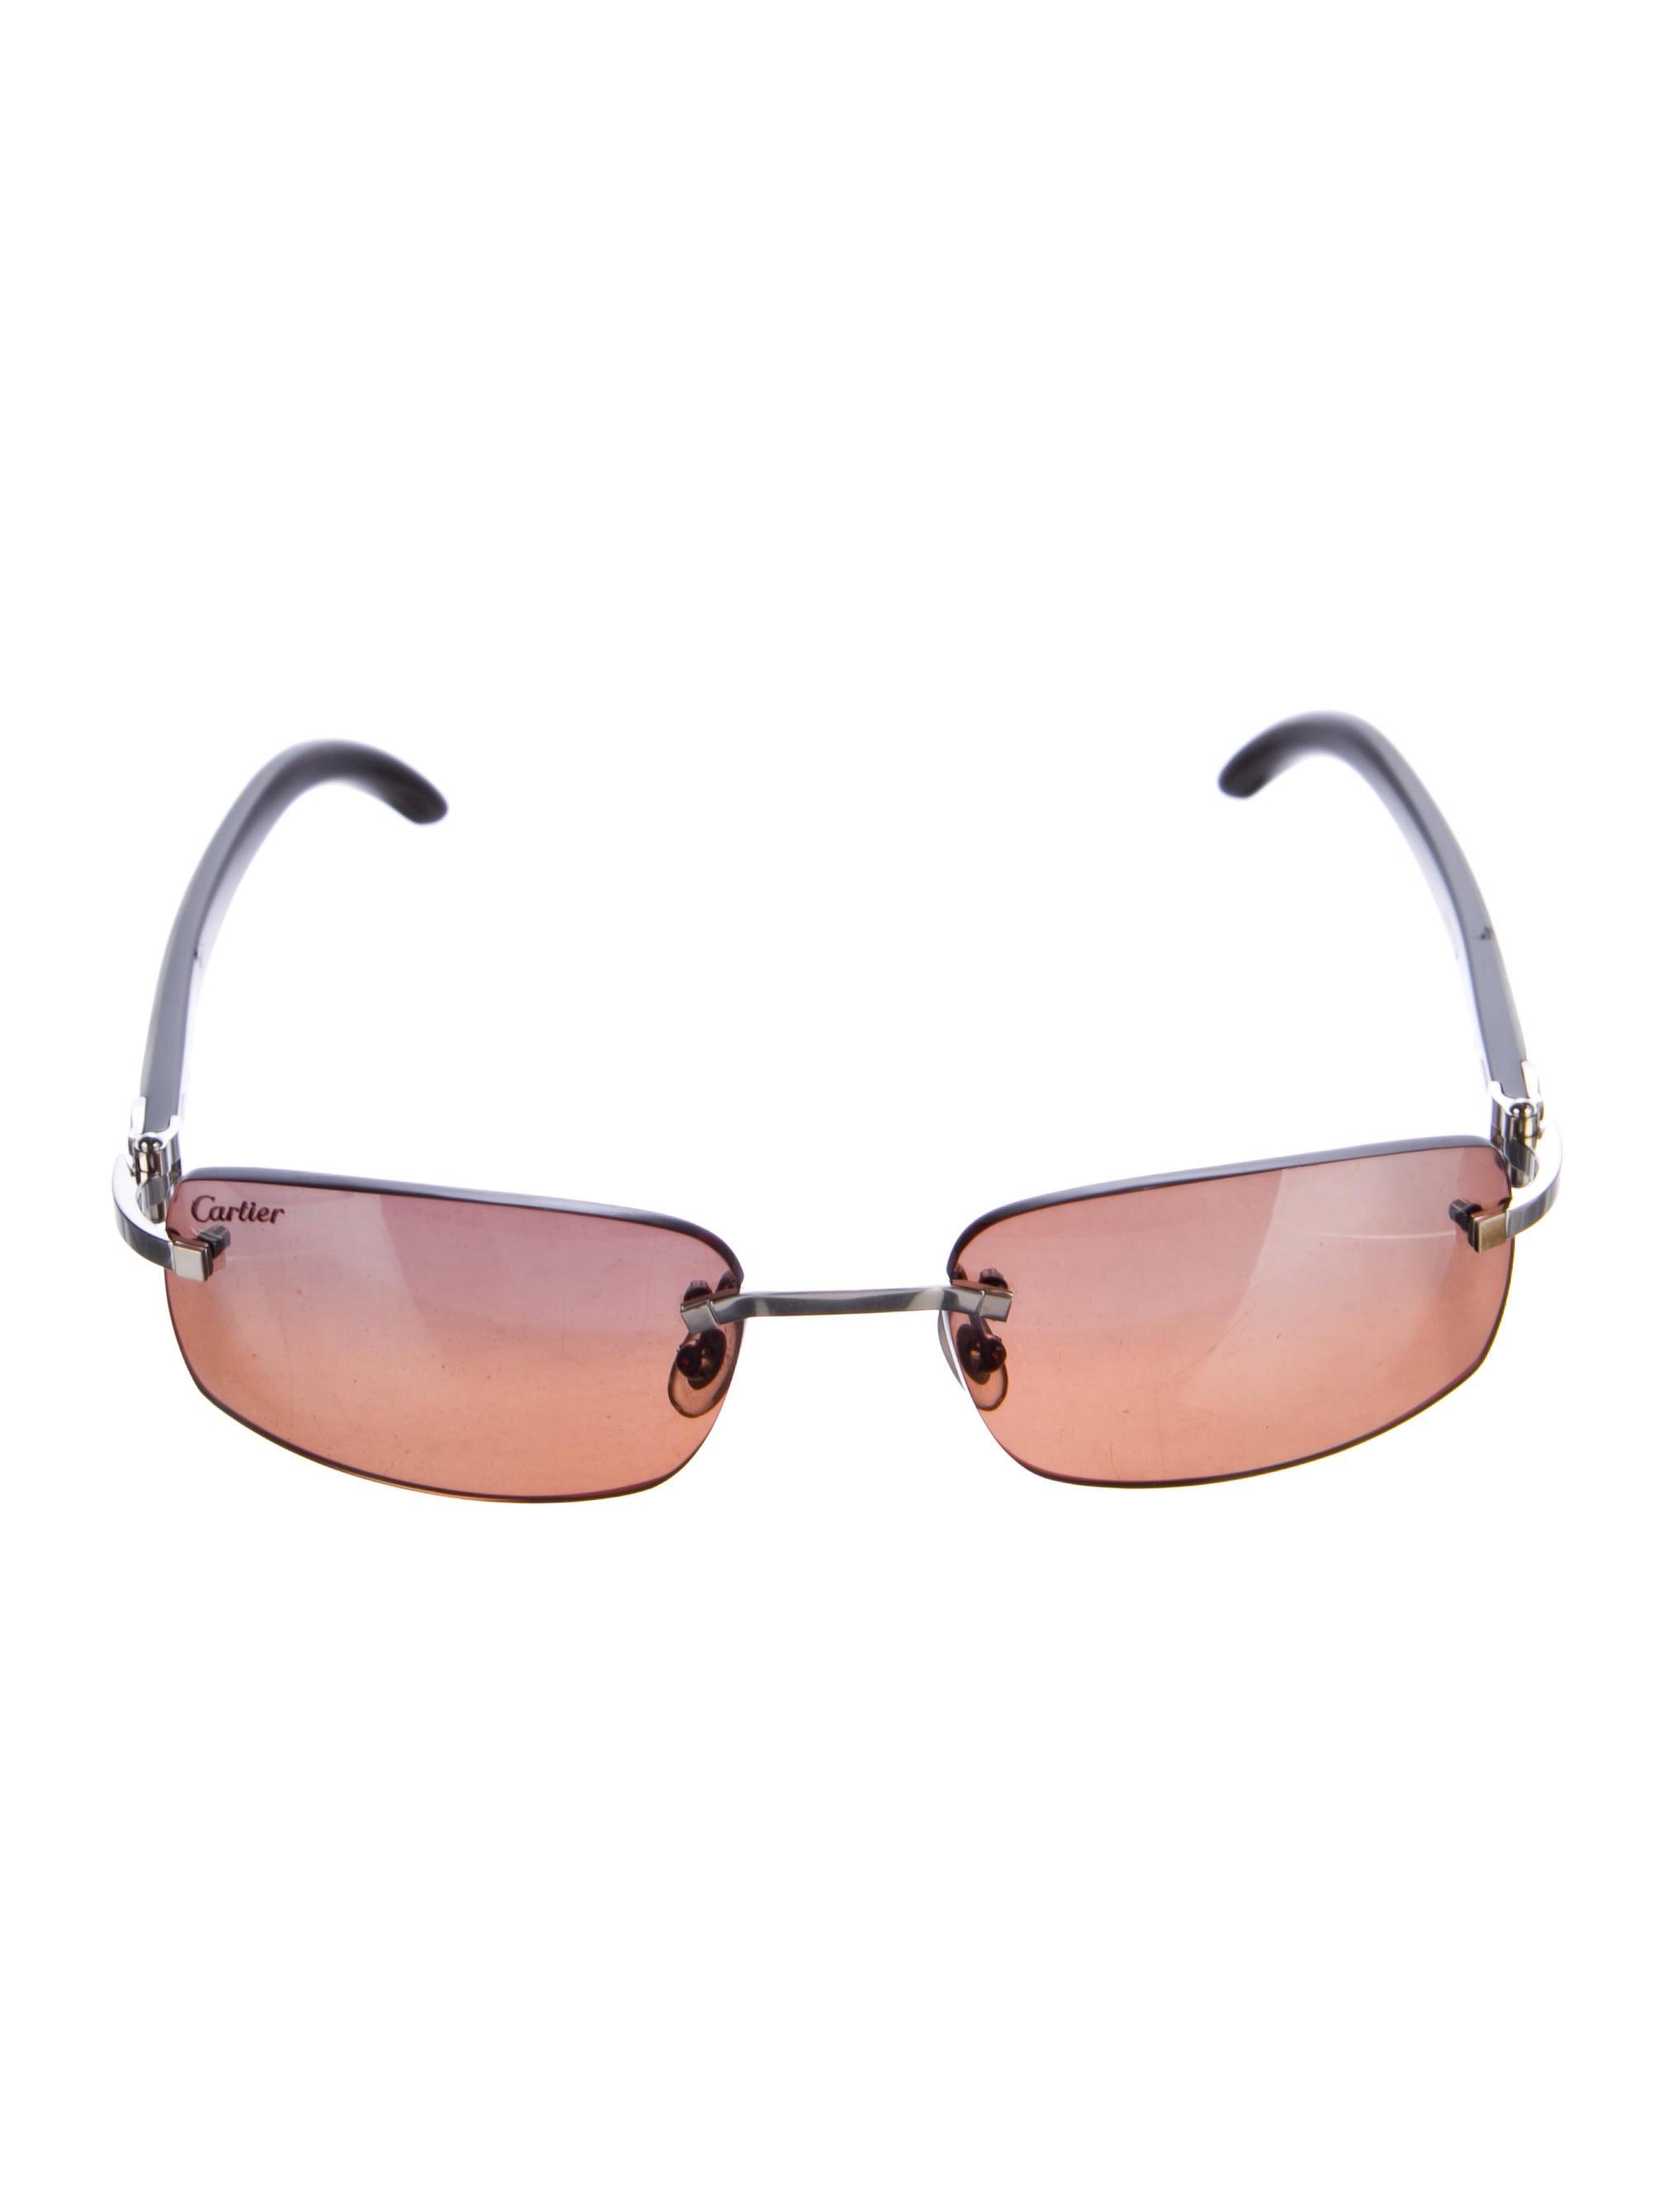 b8d33f21191 Cartier C Decor Sperone White Buffalo Horn Sunglasses - Accessories ...